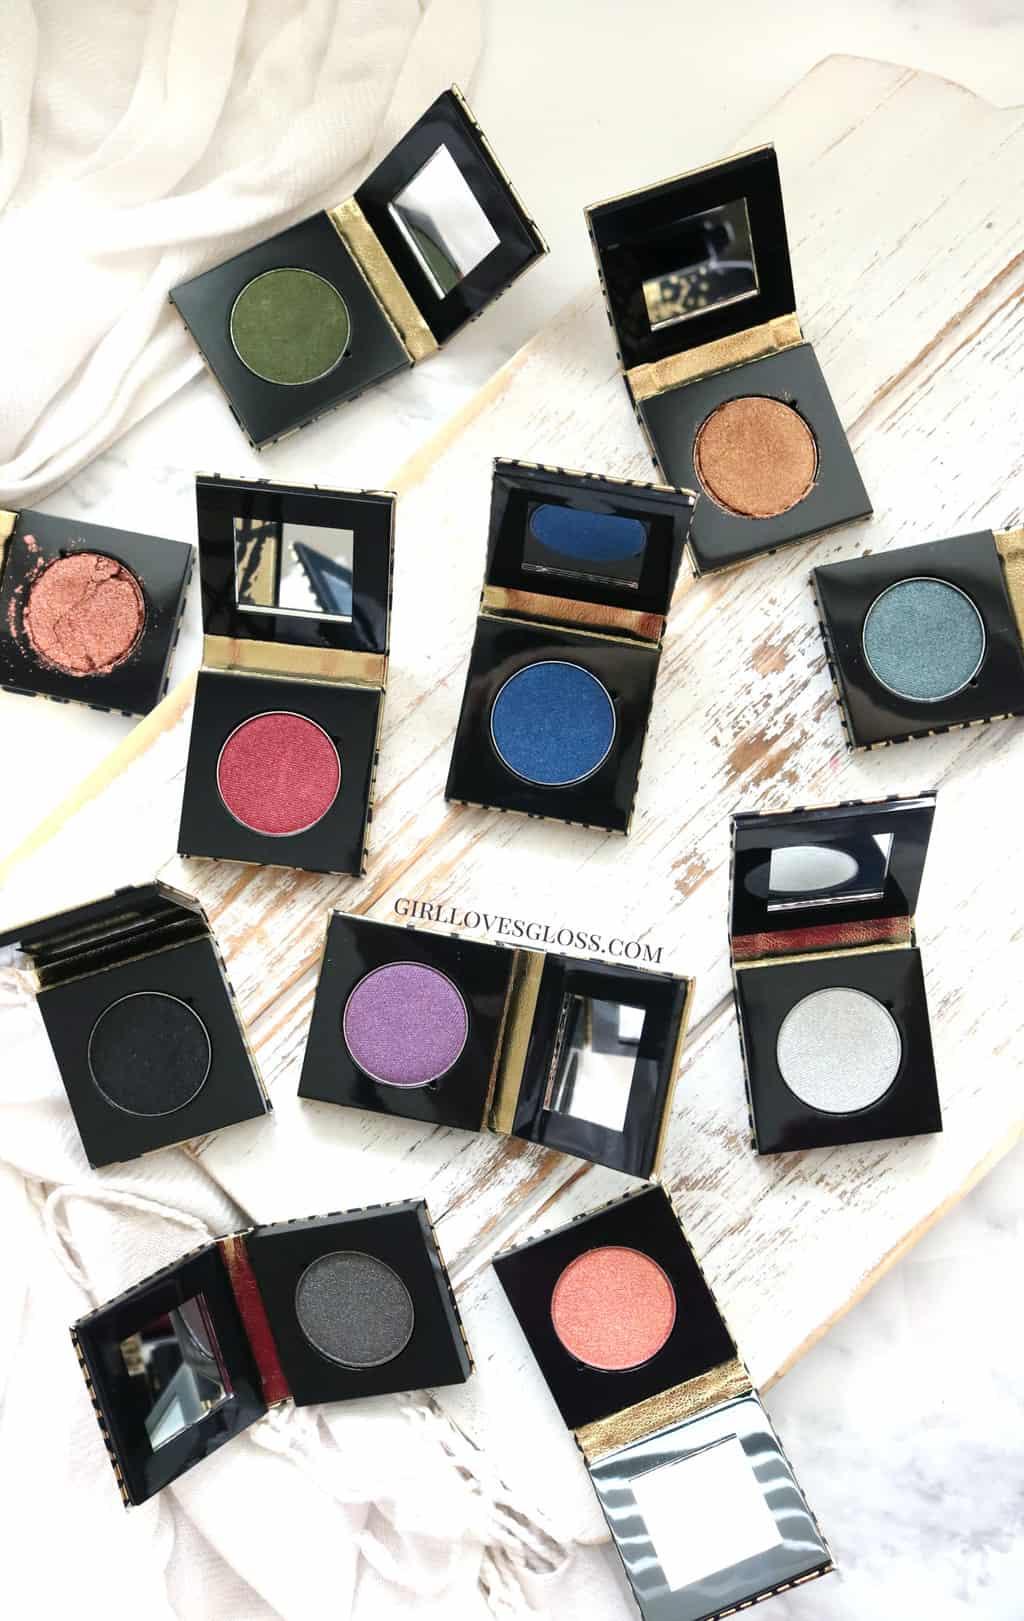 Tarte Metallic Eyeshadow Review